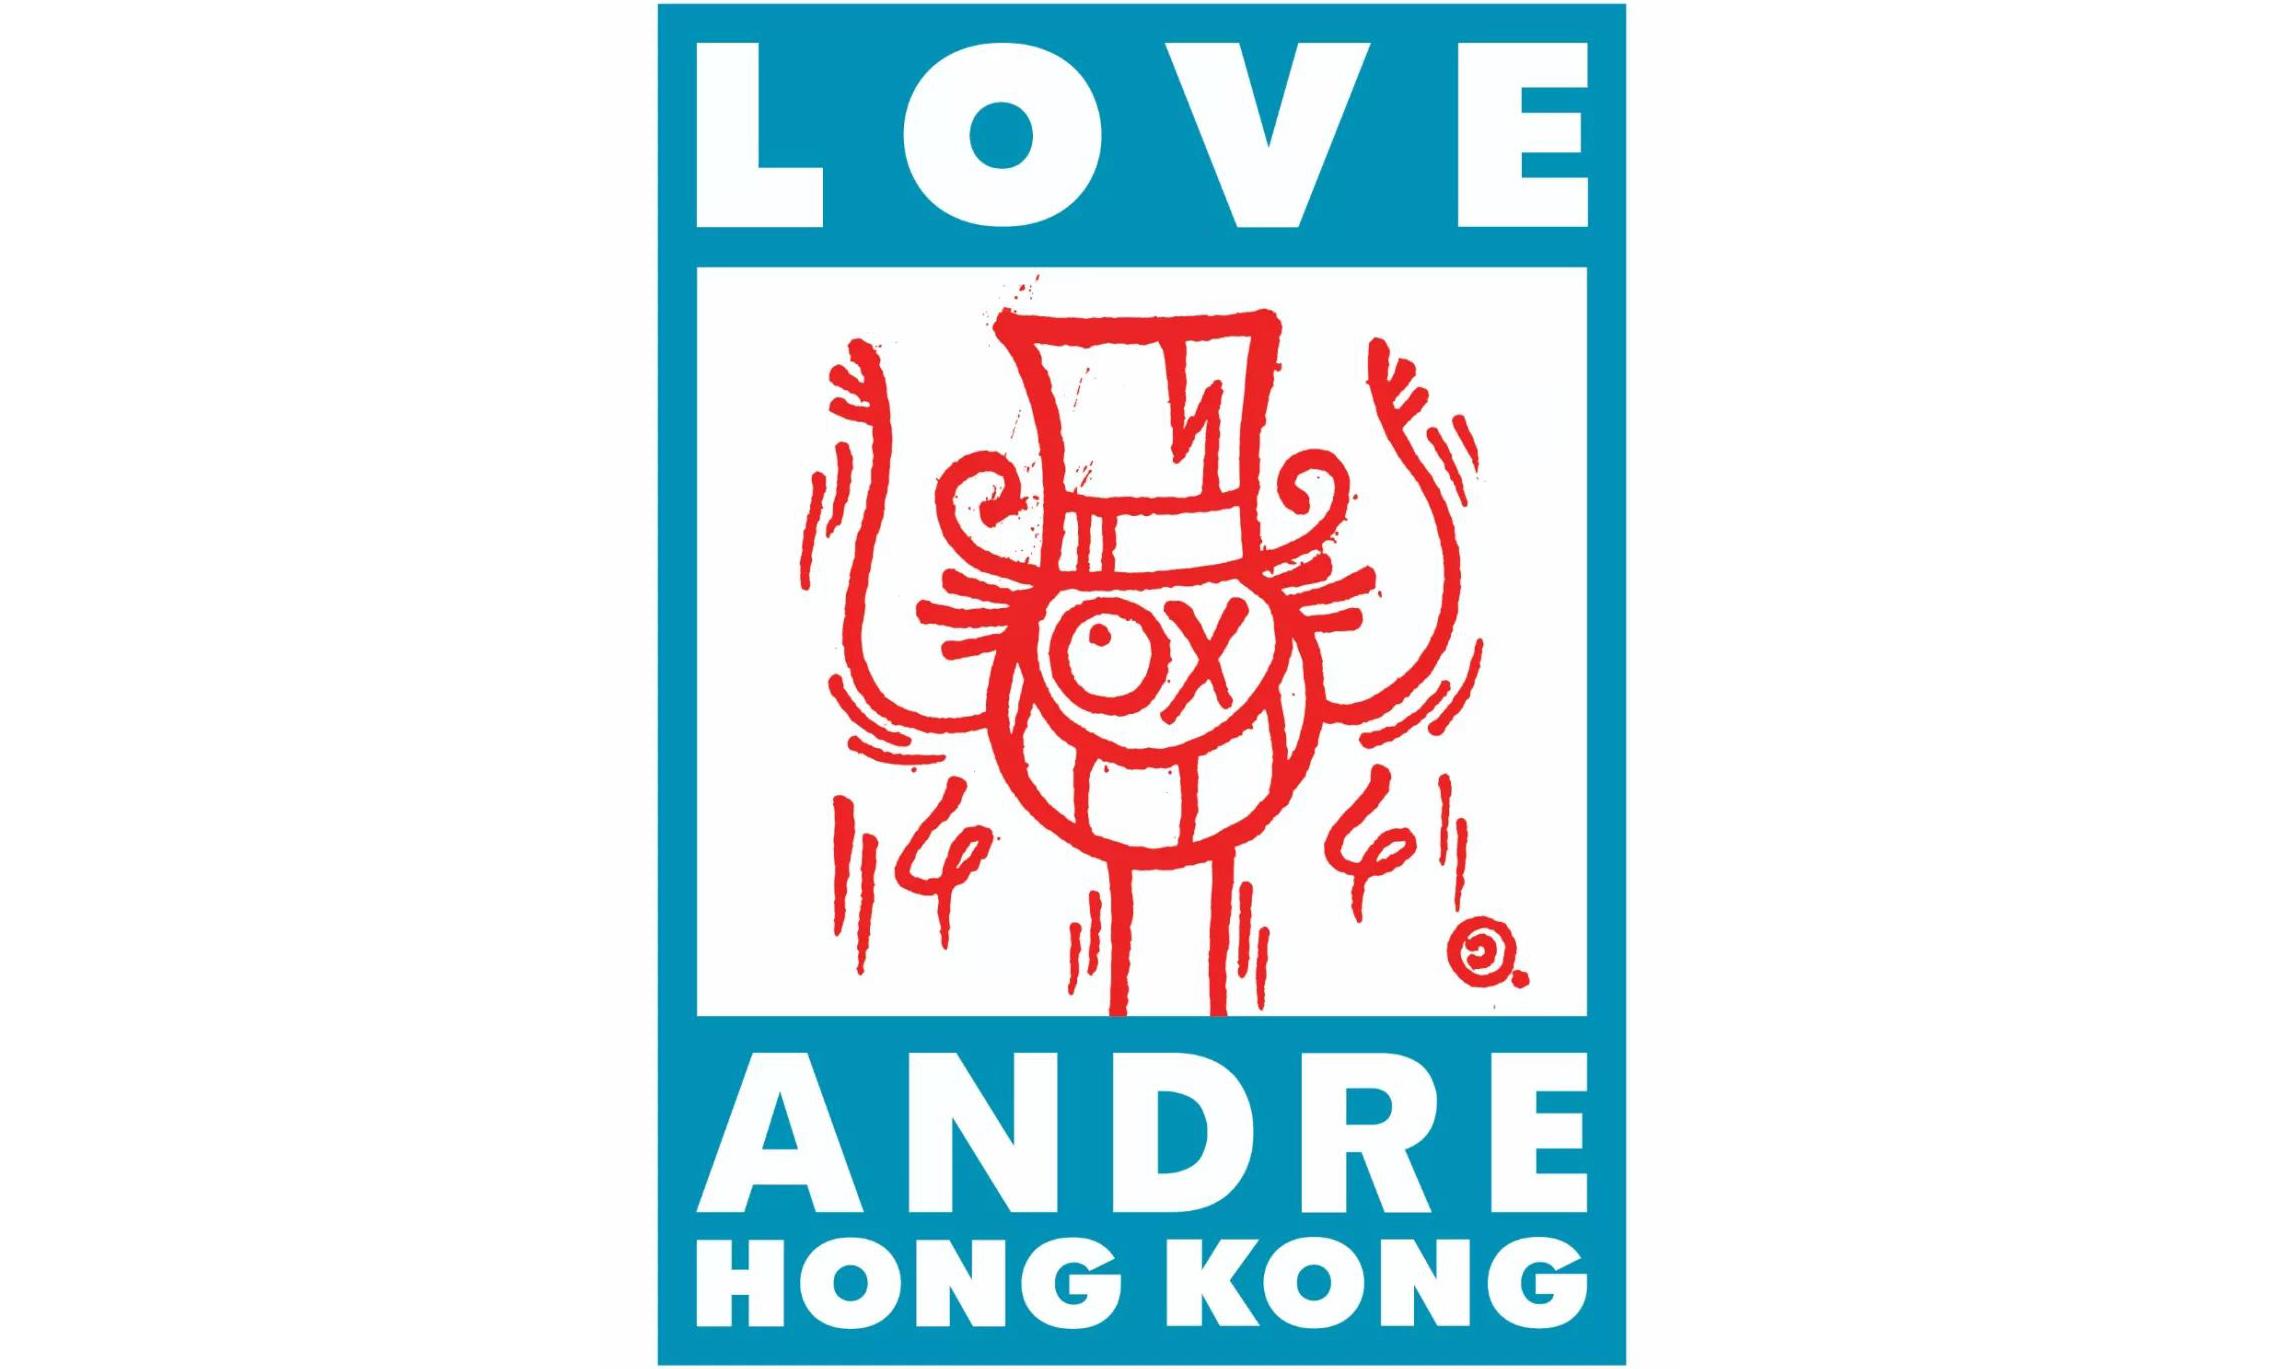 André Saraiva 将于香港巴塞尔艺术周期间举办个展